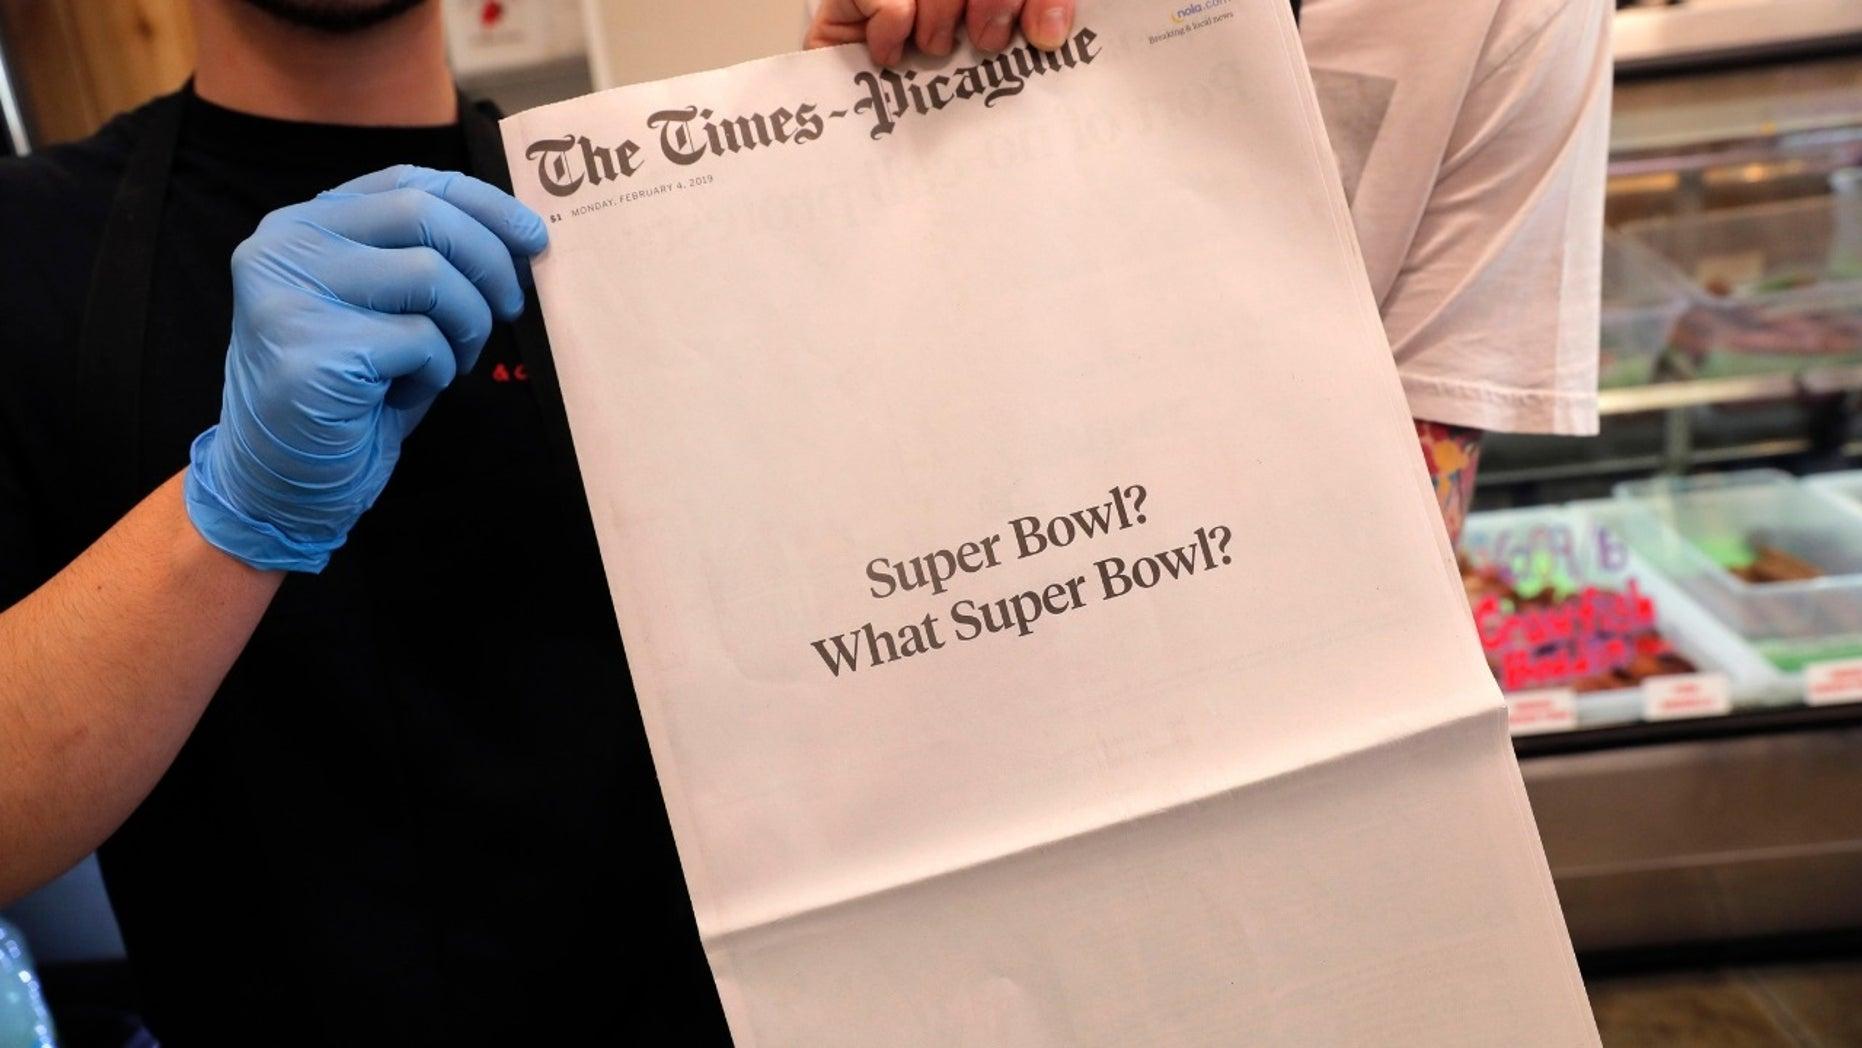 Saints fans across Baton Rouge join in the Boycott Bowl